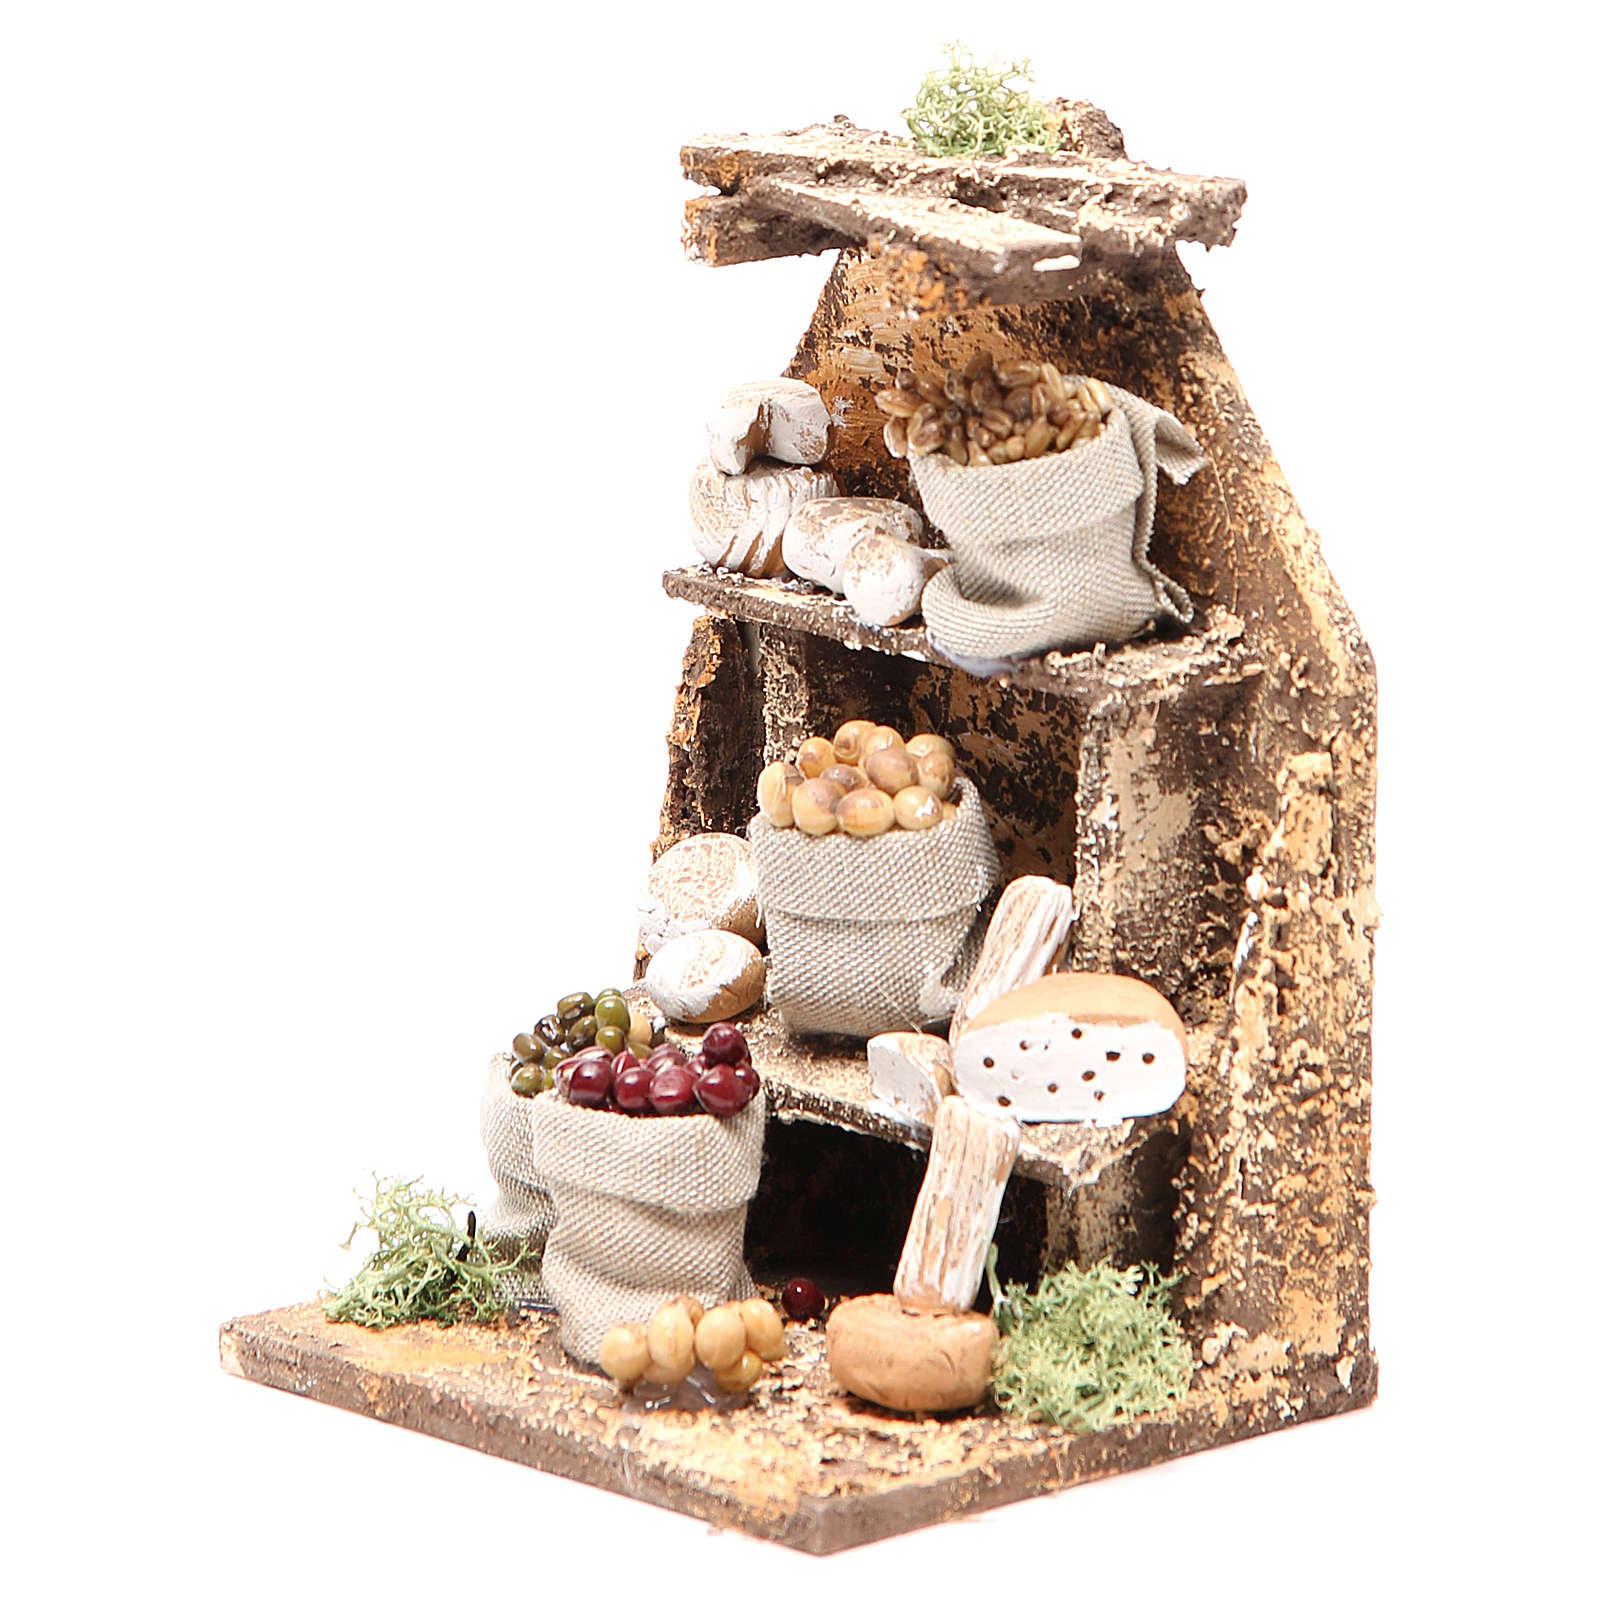 Set with Cheeses 15x10x9cm neapolitan Nativity 4